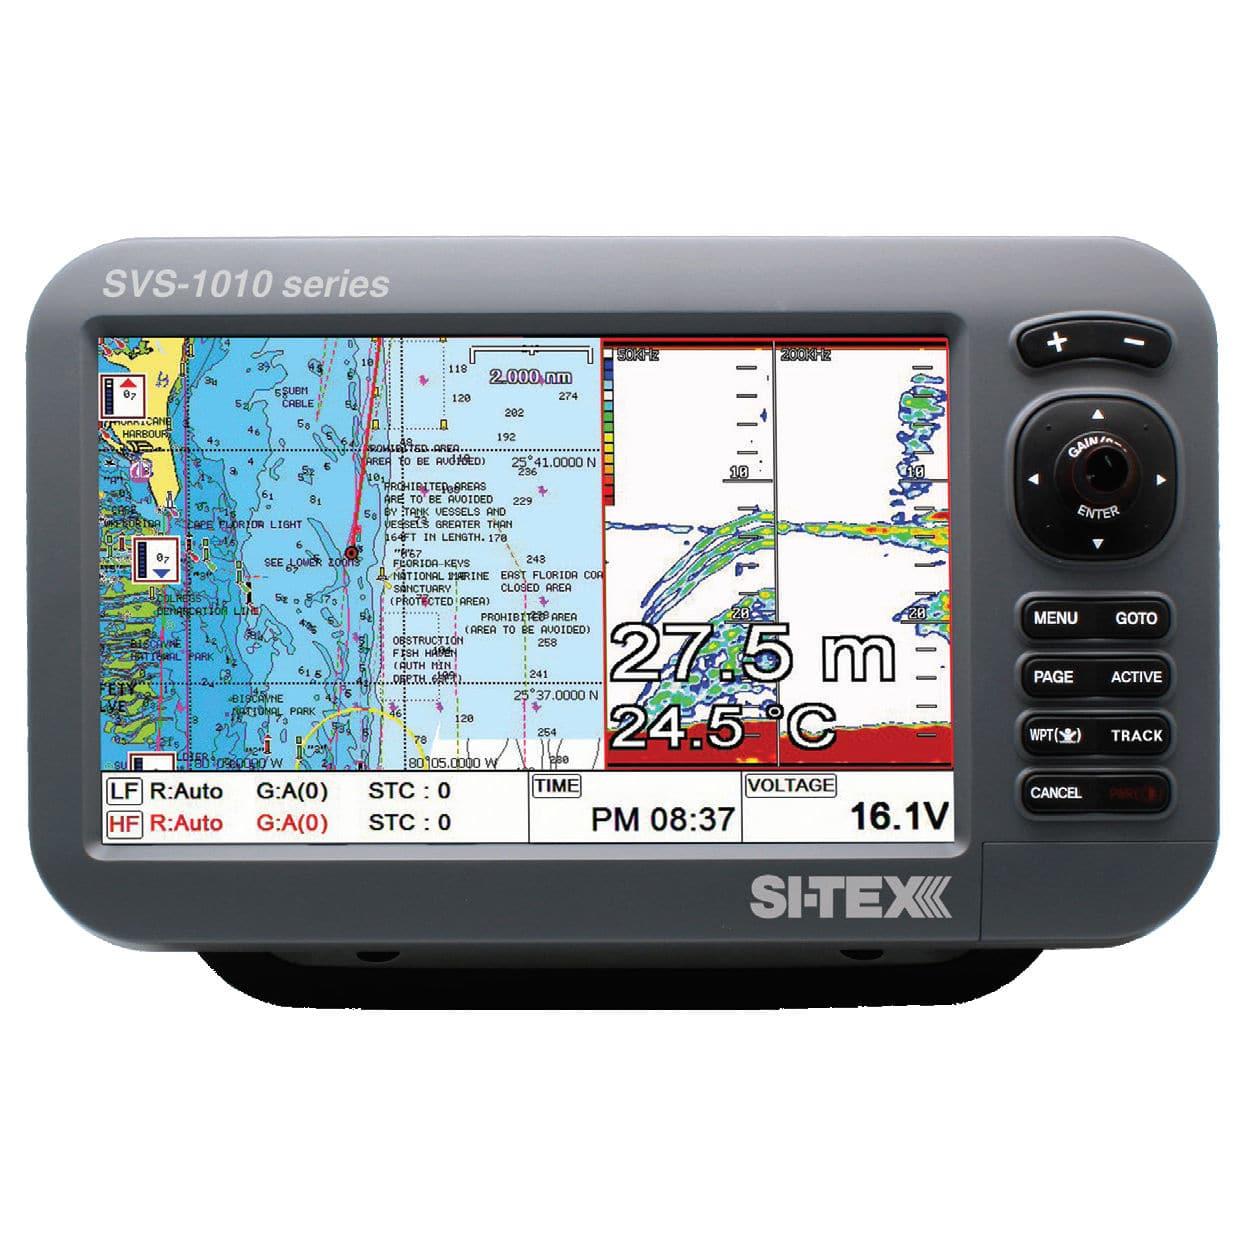 chart plotter / gps / fishfinder / for boats - svs-1010c - si-tex, Fish Finder